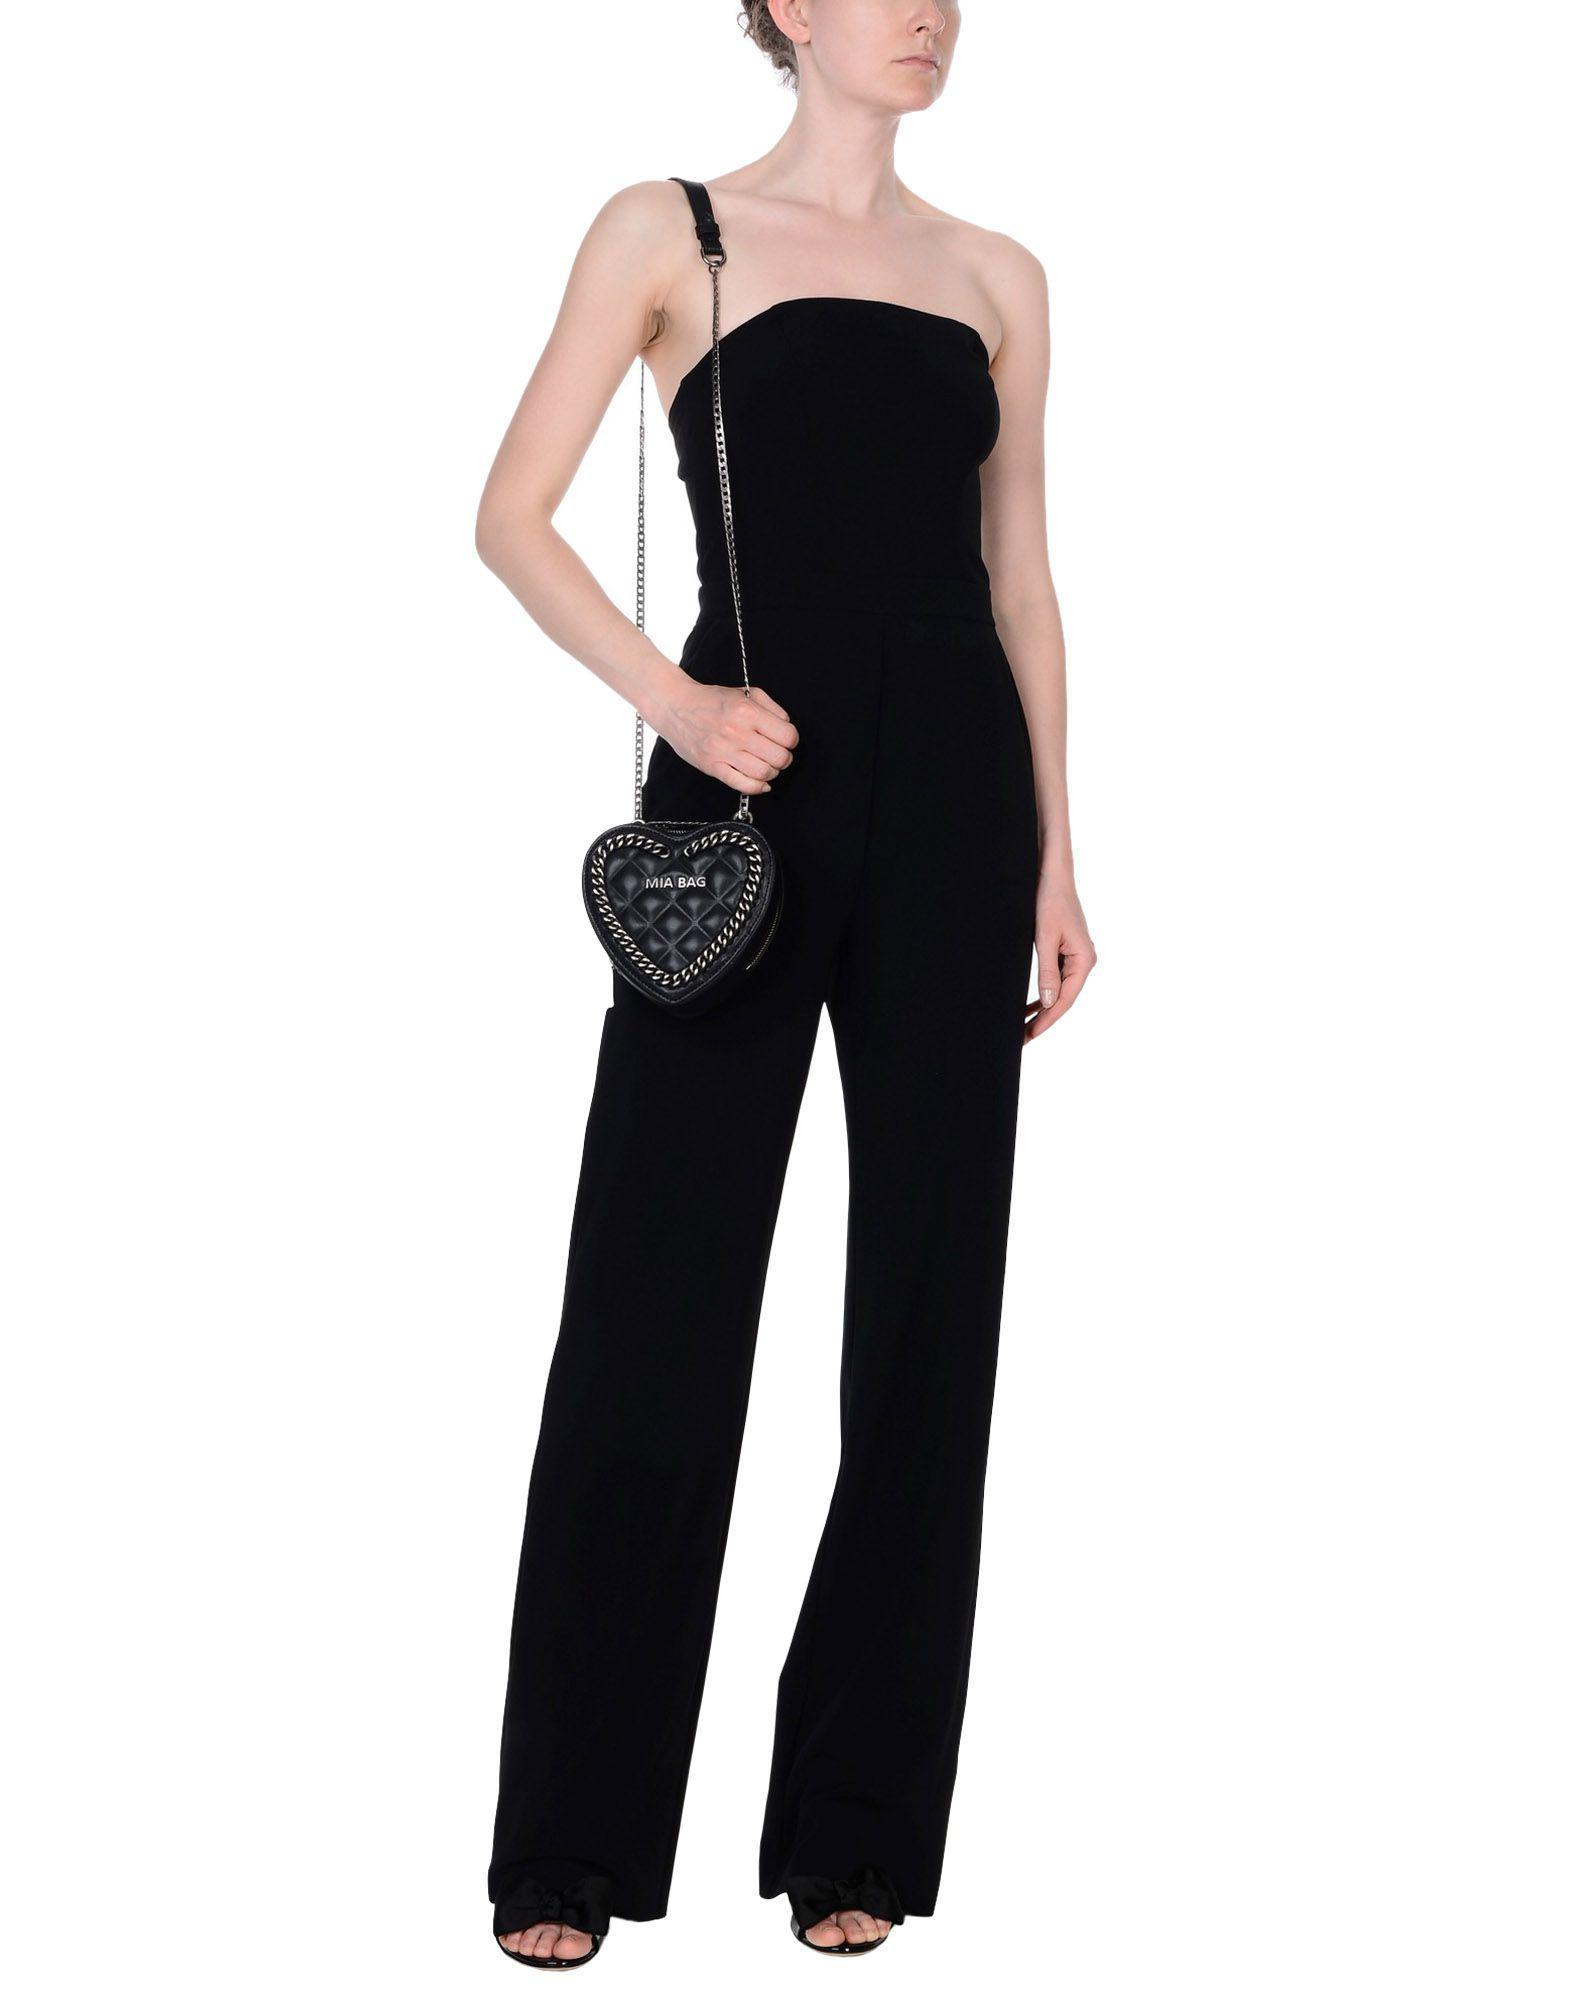 Mia Bag Leather Cross-body Bag in Black